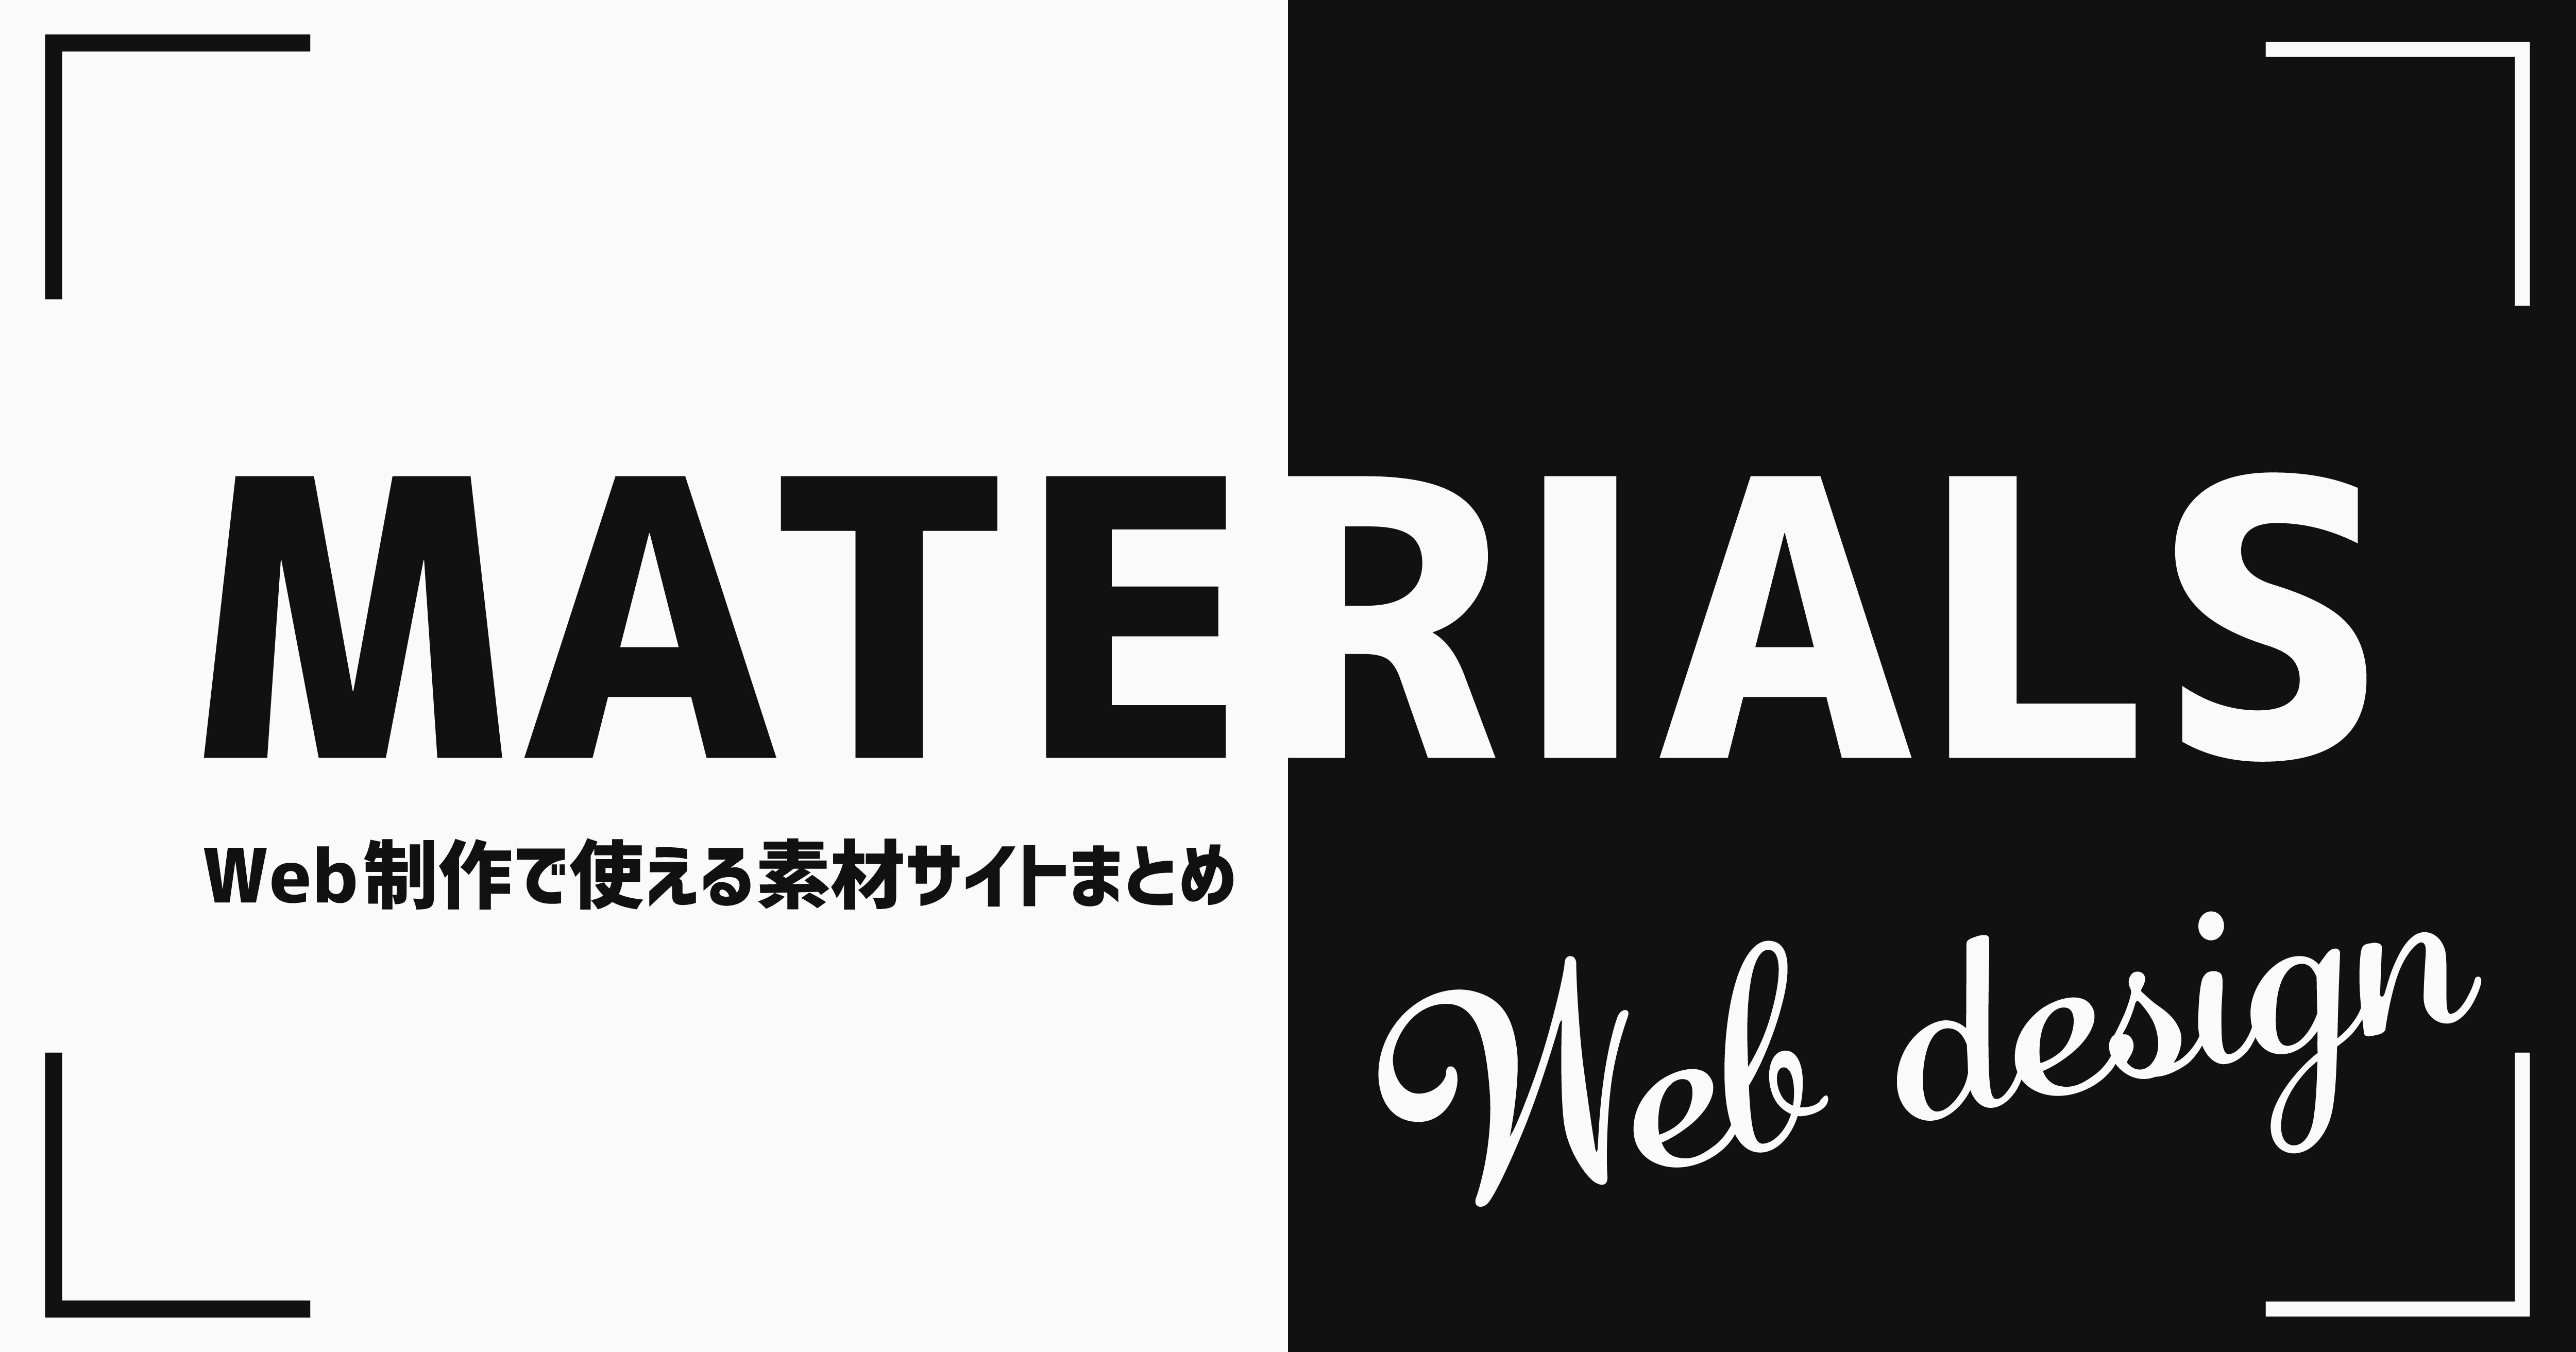 Web制作で使える素材サイトまとめ